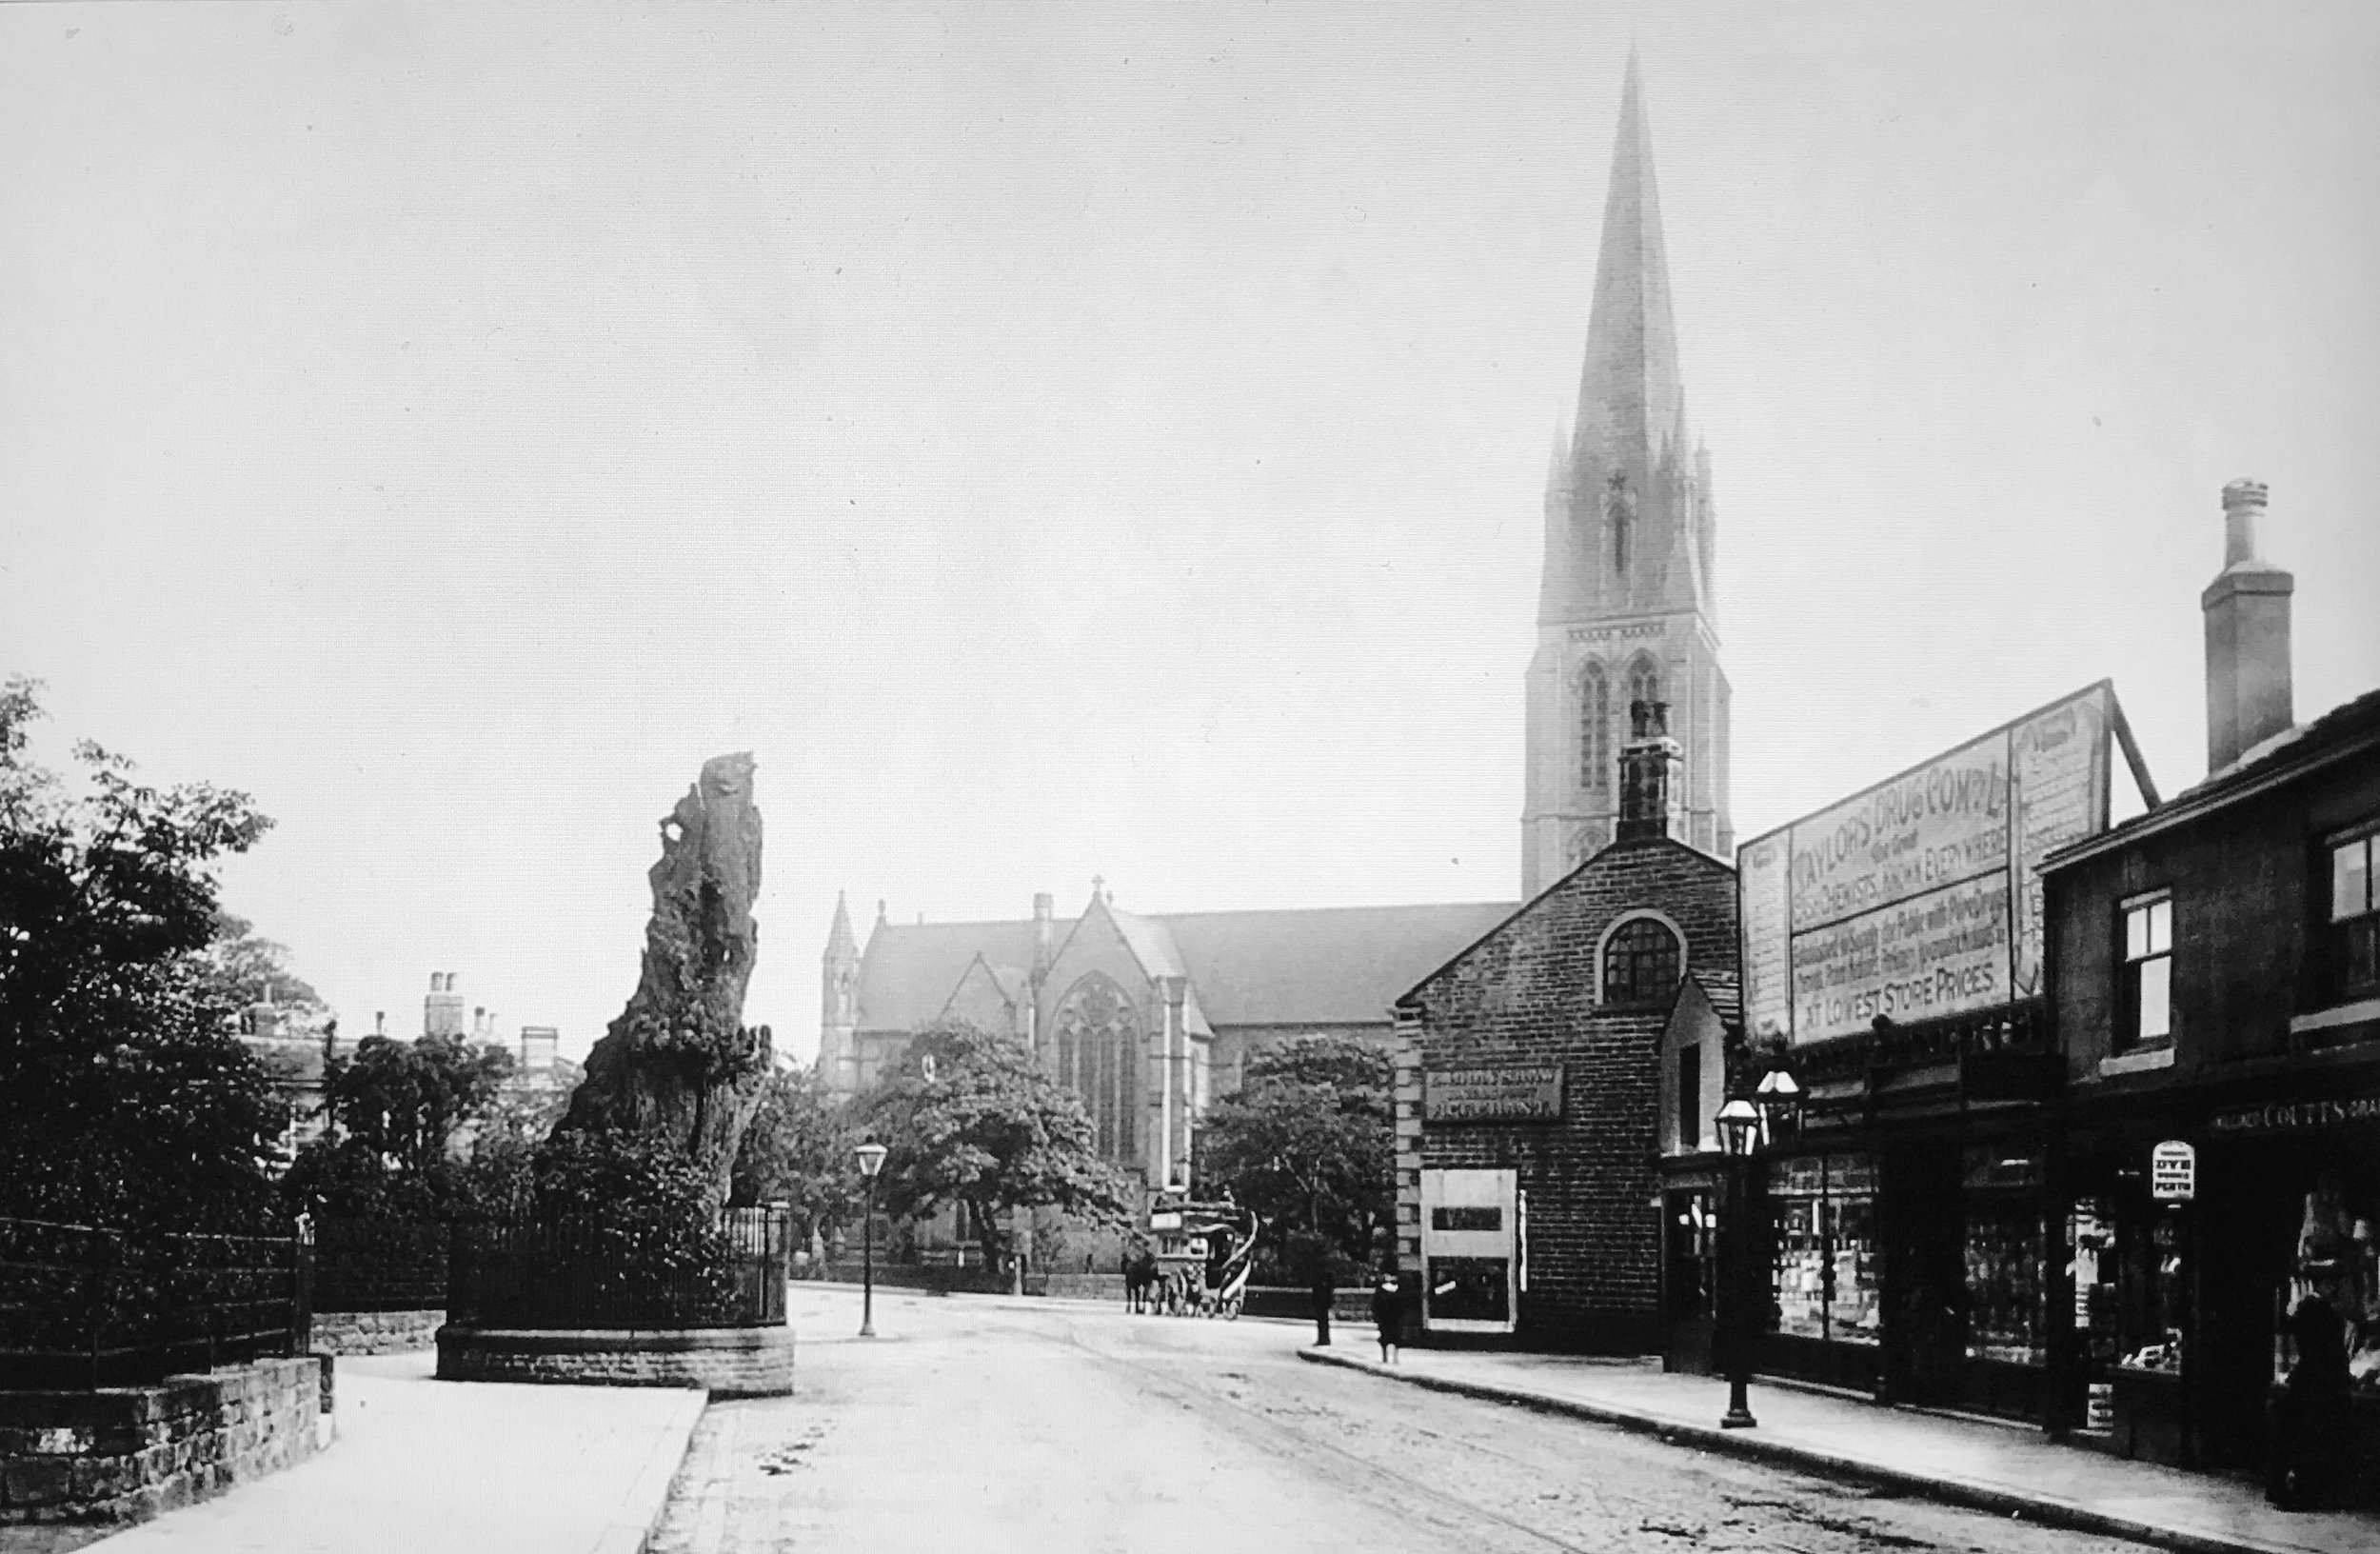 St Michael's Church and Skyrack Inn, 1897